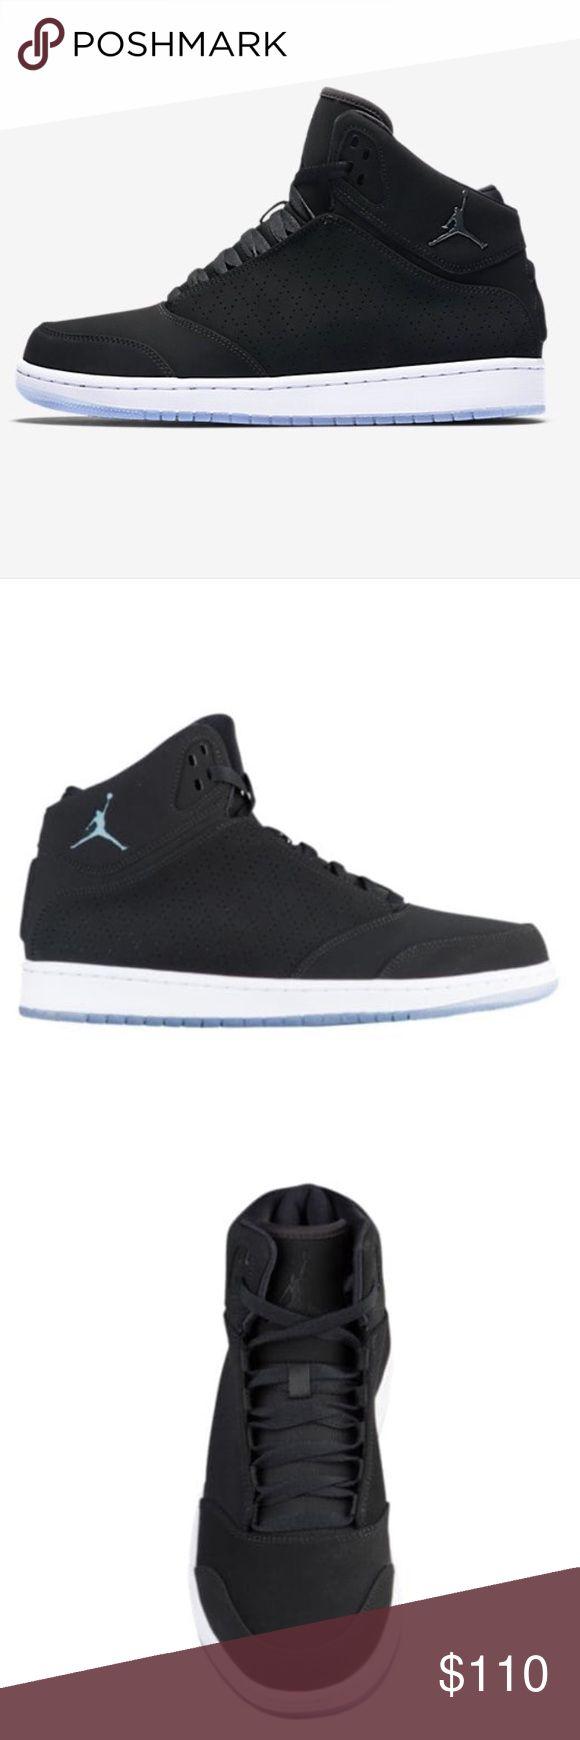 (Rare) Jordan 1 Premium 5 Brand new. Never worn. Box doesn't come with it. The Jordan symbol is greenish blue. Jordan Shoes Athletic Shoes